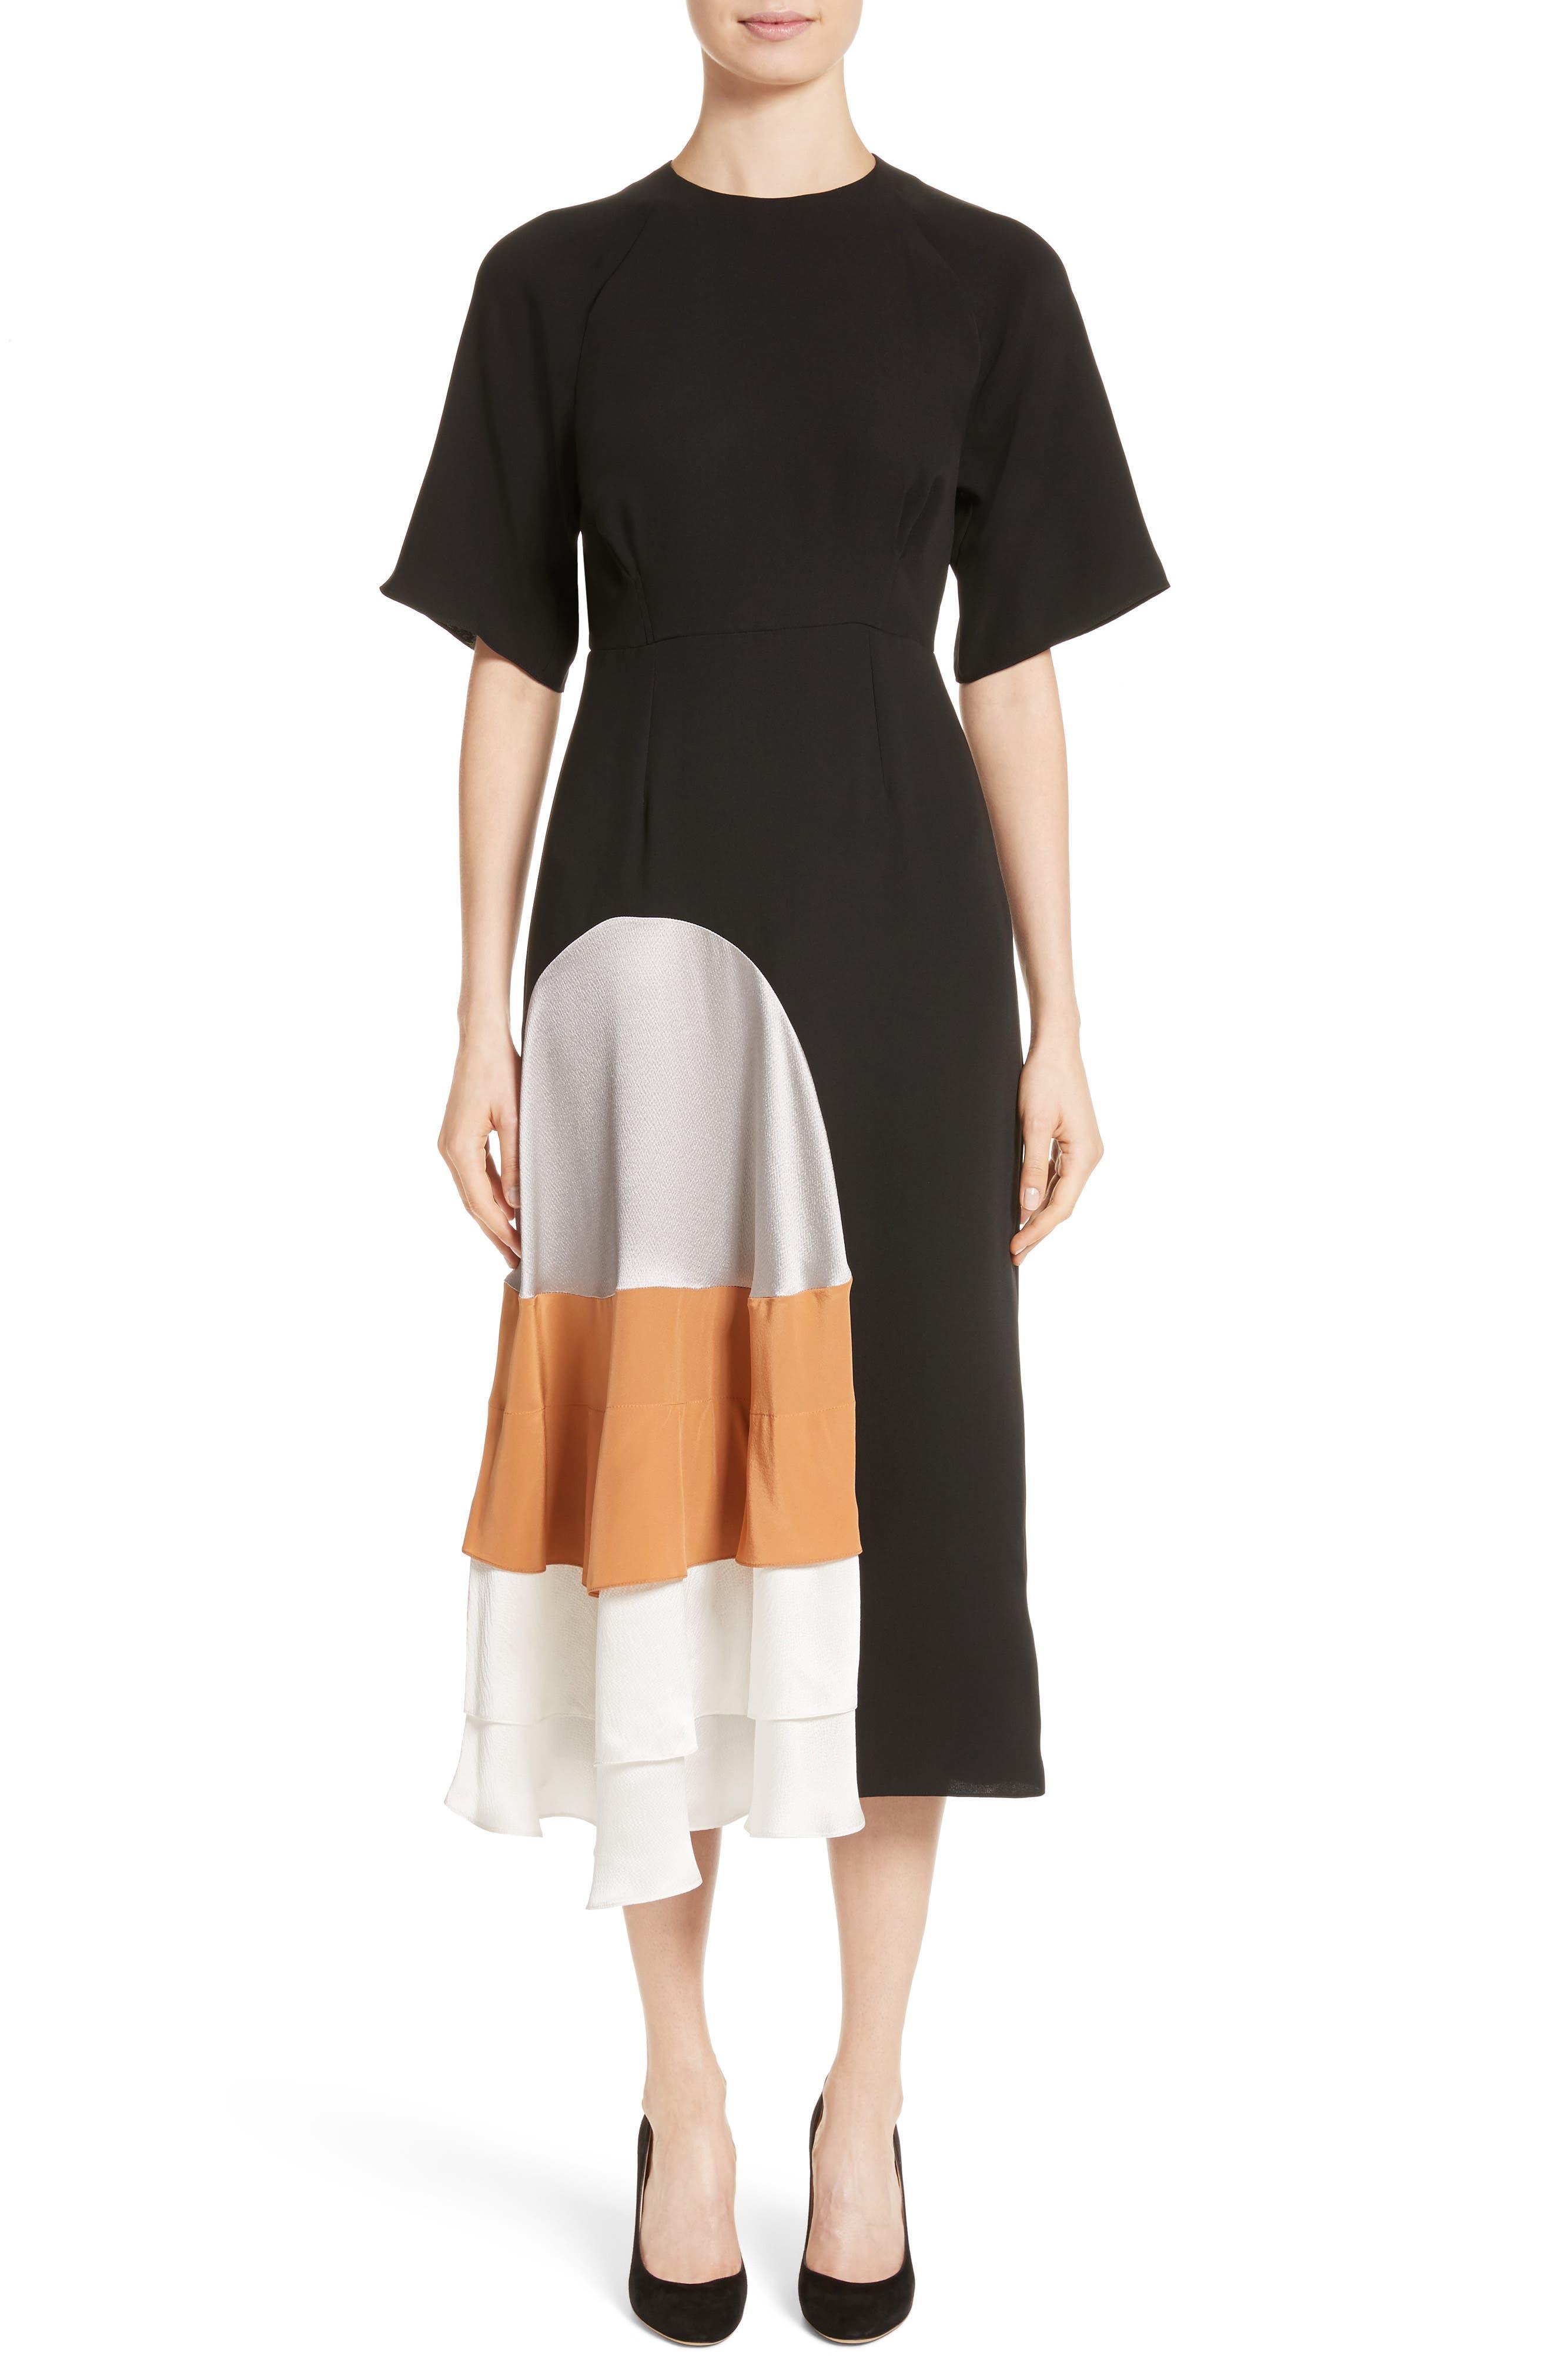 Rauma Silk Dress,                         Main,                         color, Black/ Silver/ Sand/ Ivory